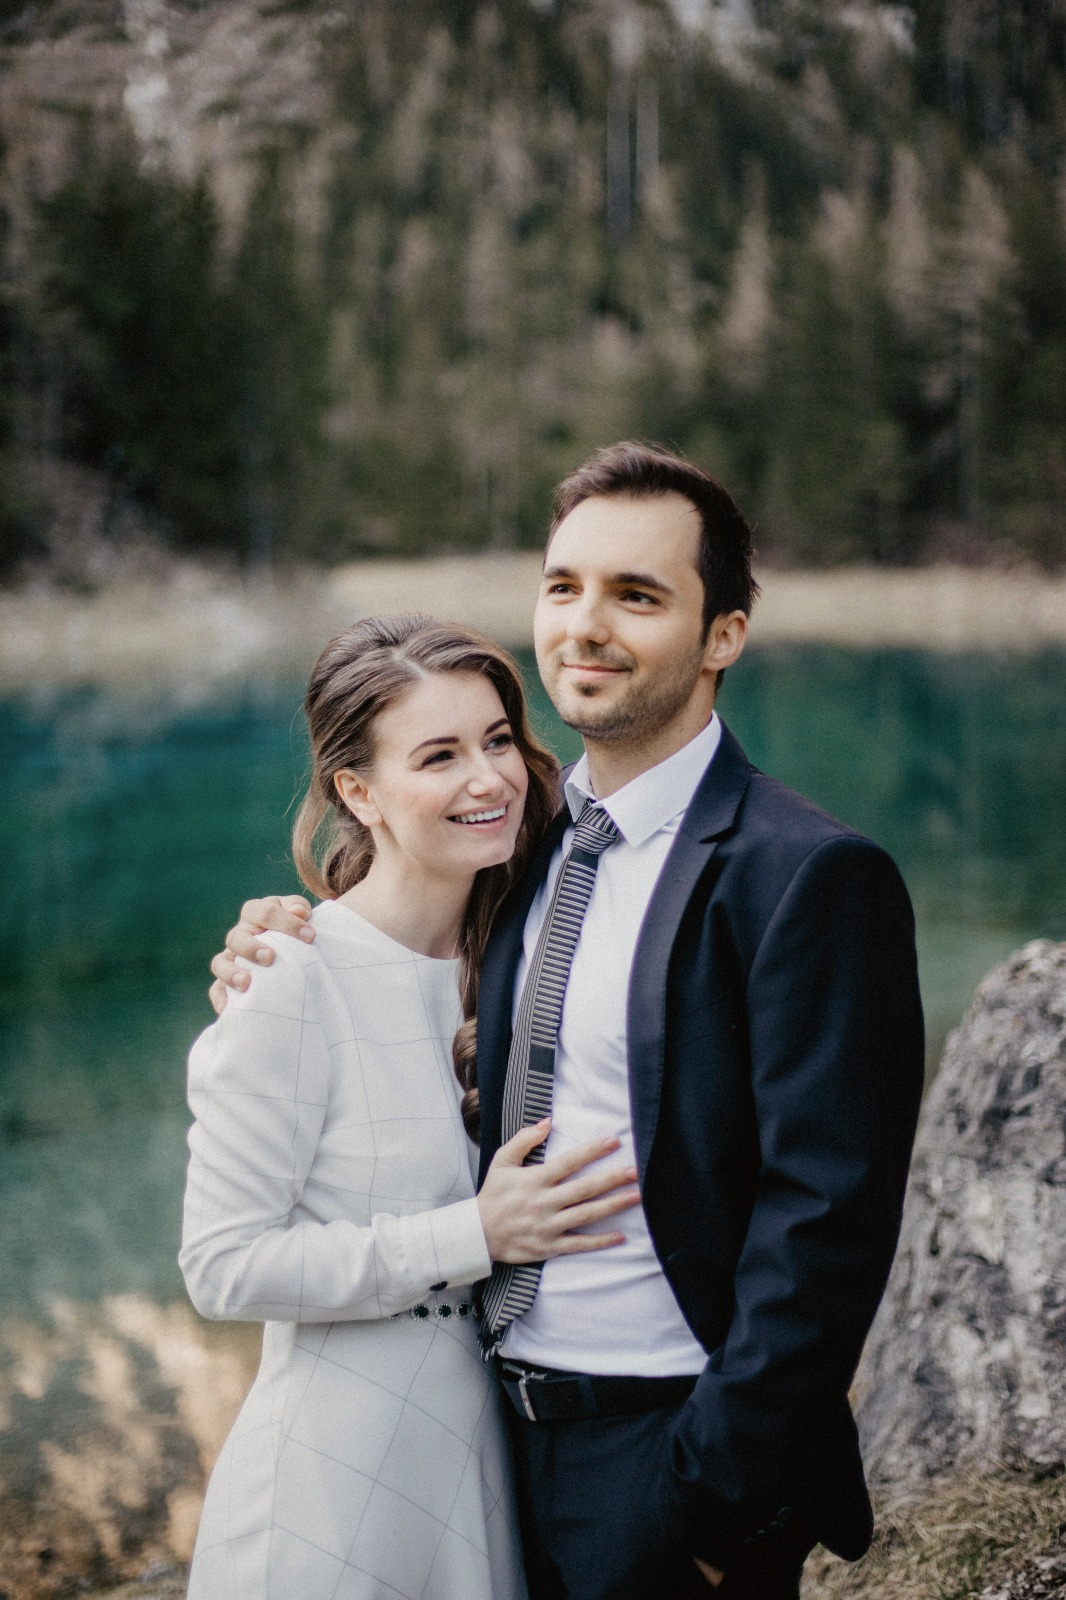 Nunta Daniel & Roxana Cendes